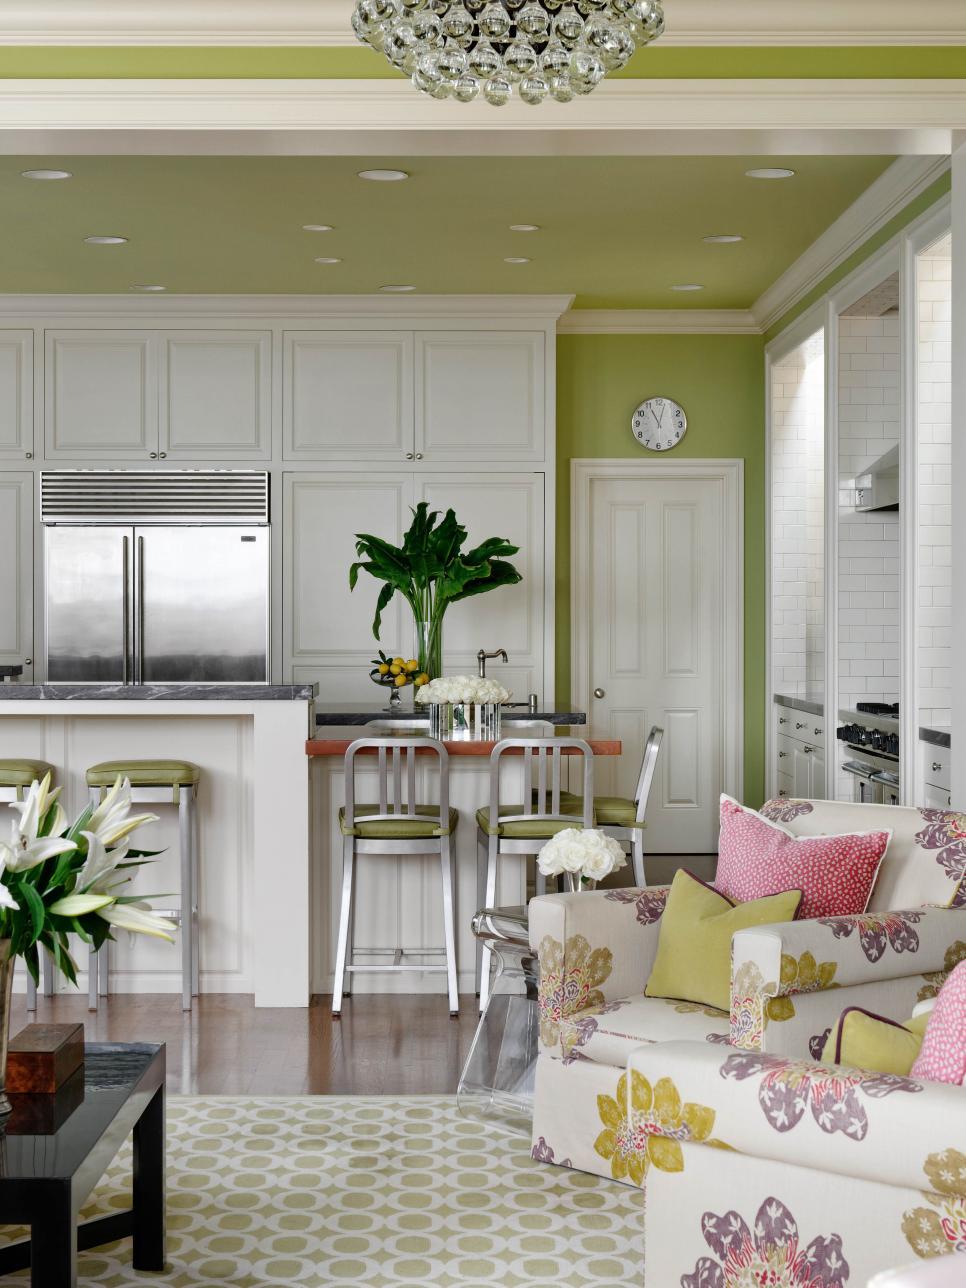 http://hgtvhome.sndimg.com/content/dam/images/hgtv/fullset/2013/11/11/2/DP_Kendall-Wilkinson-green-contemporary-kitchen_v.jpg.rend.hgtvcom.966.1288.jpeg